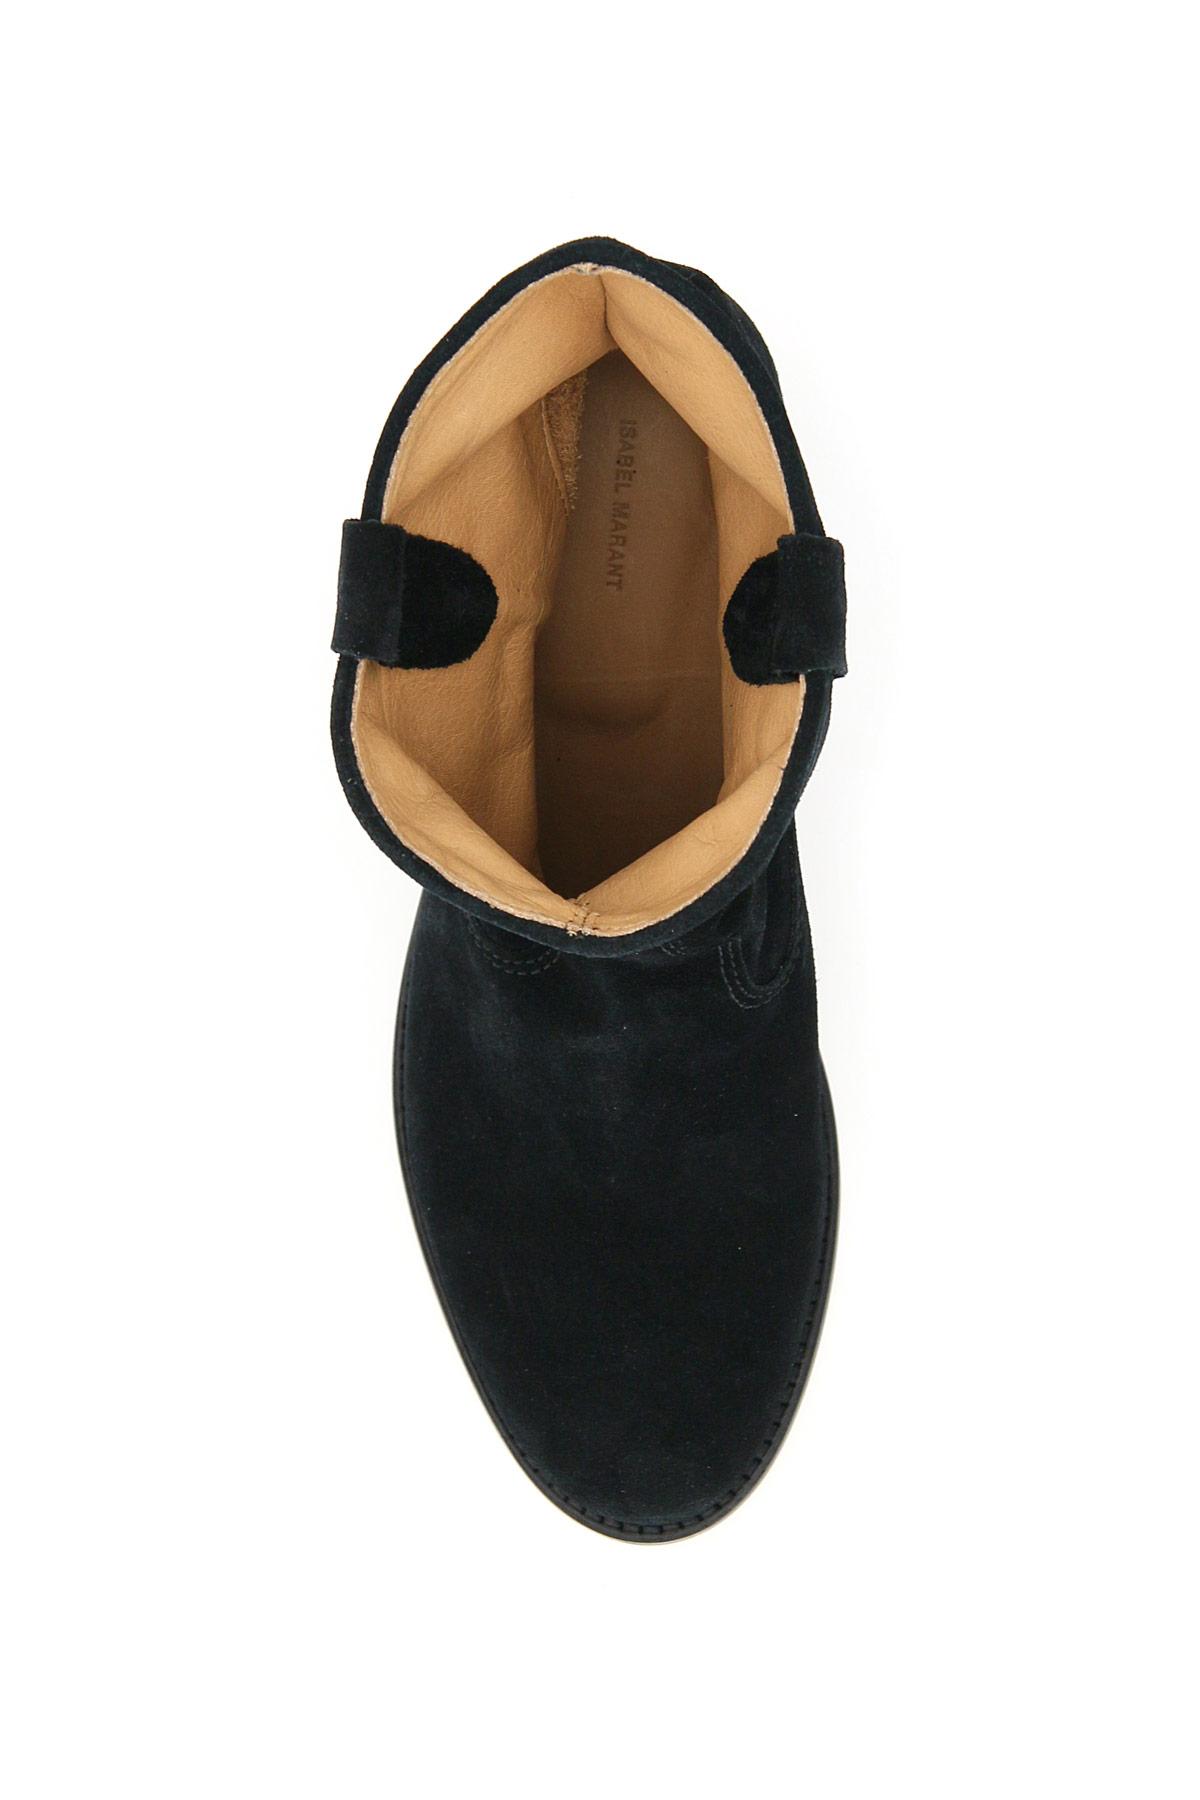 Isabel marant stivali ankle boots crisi